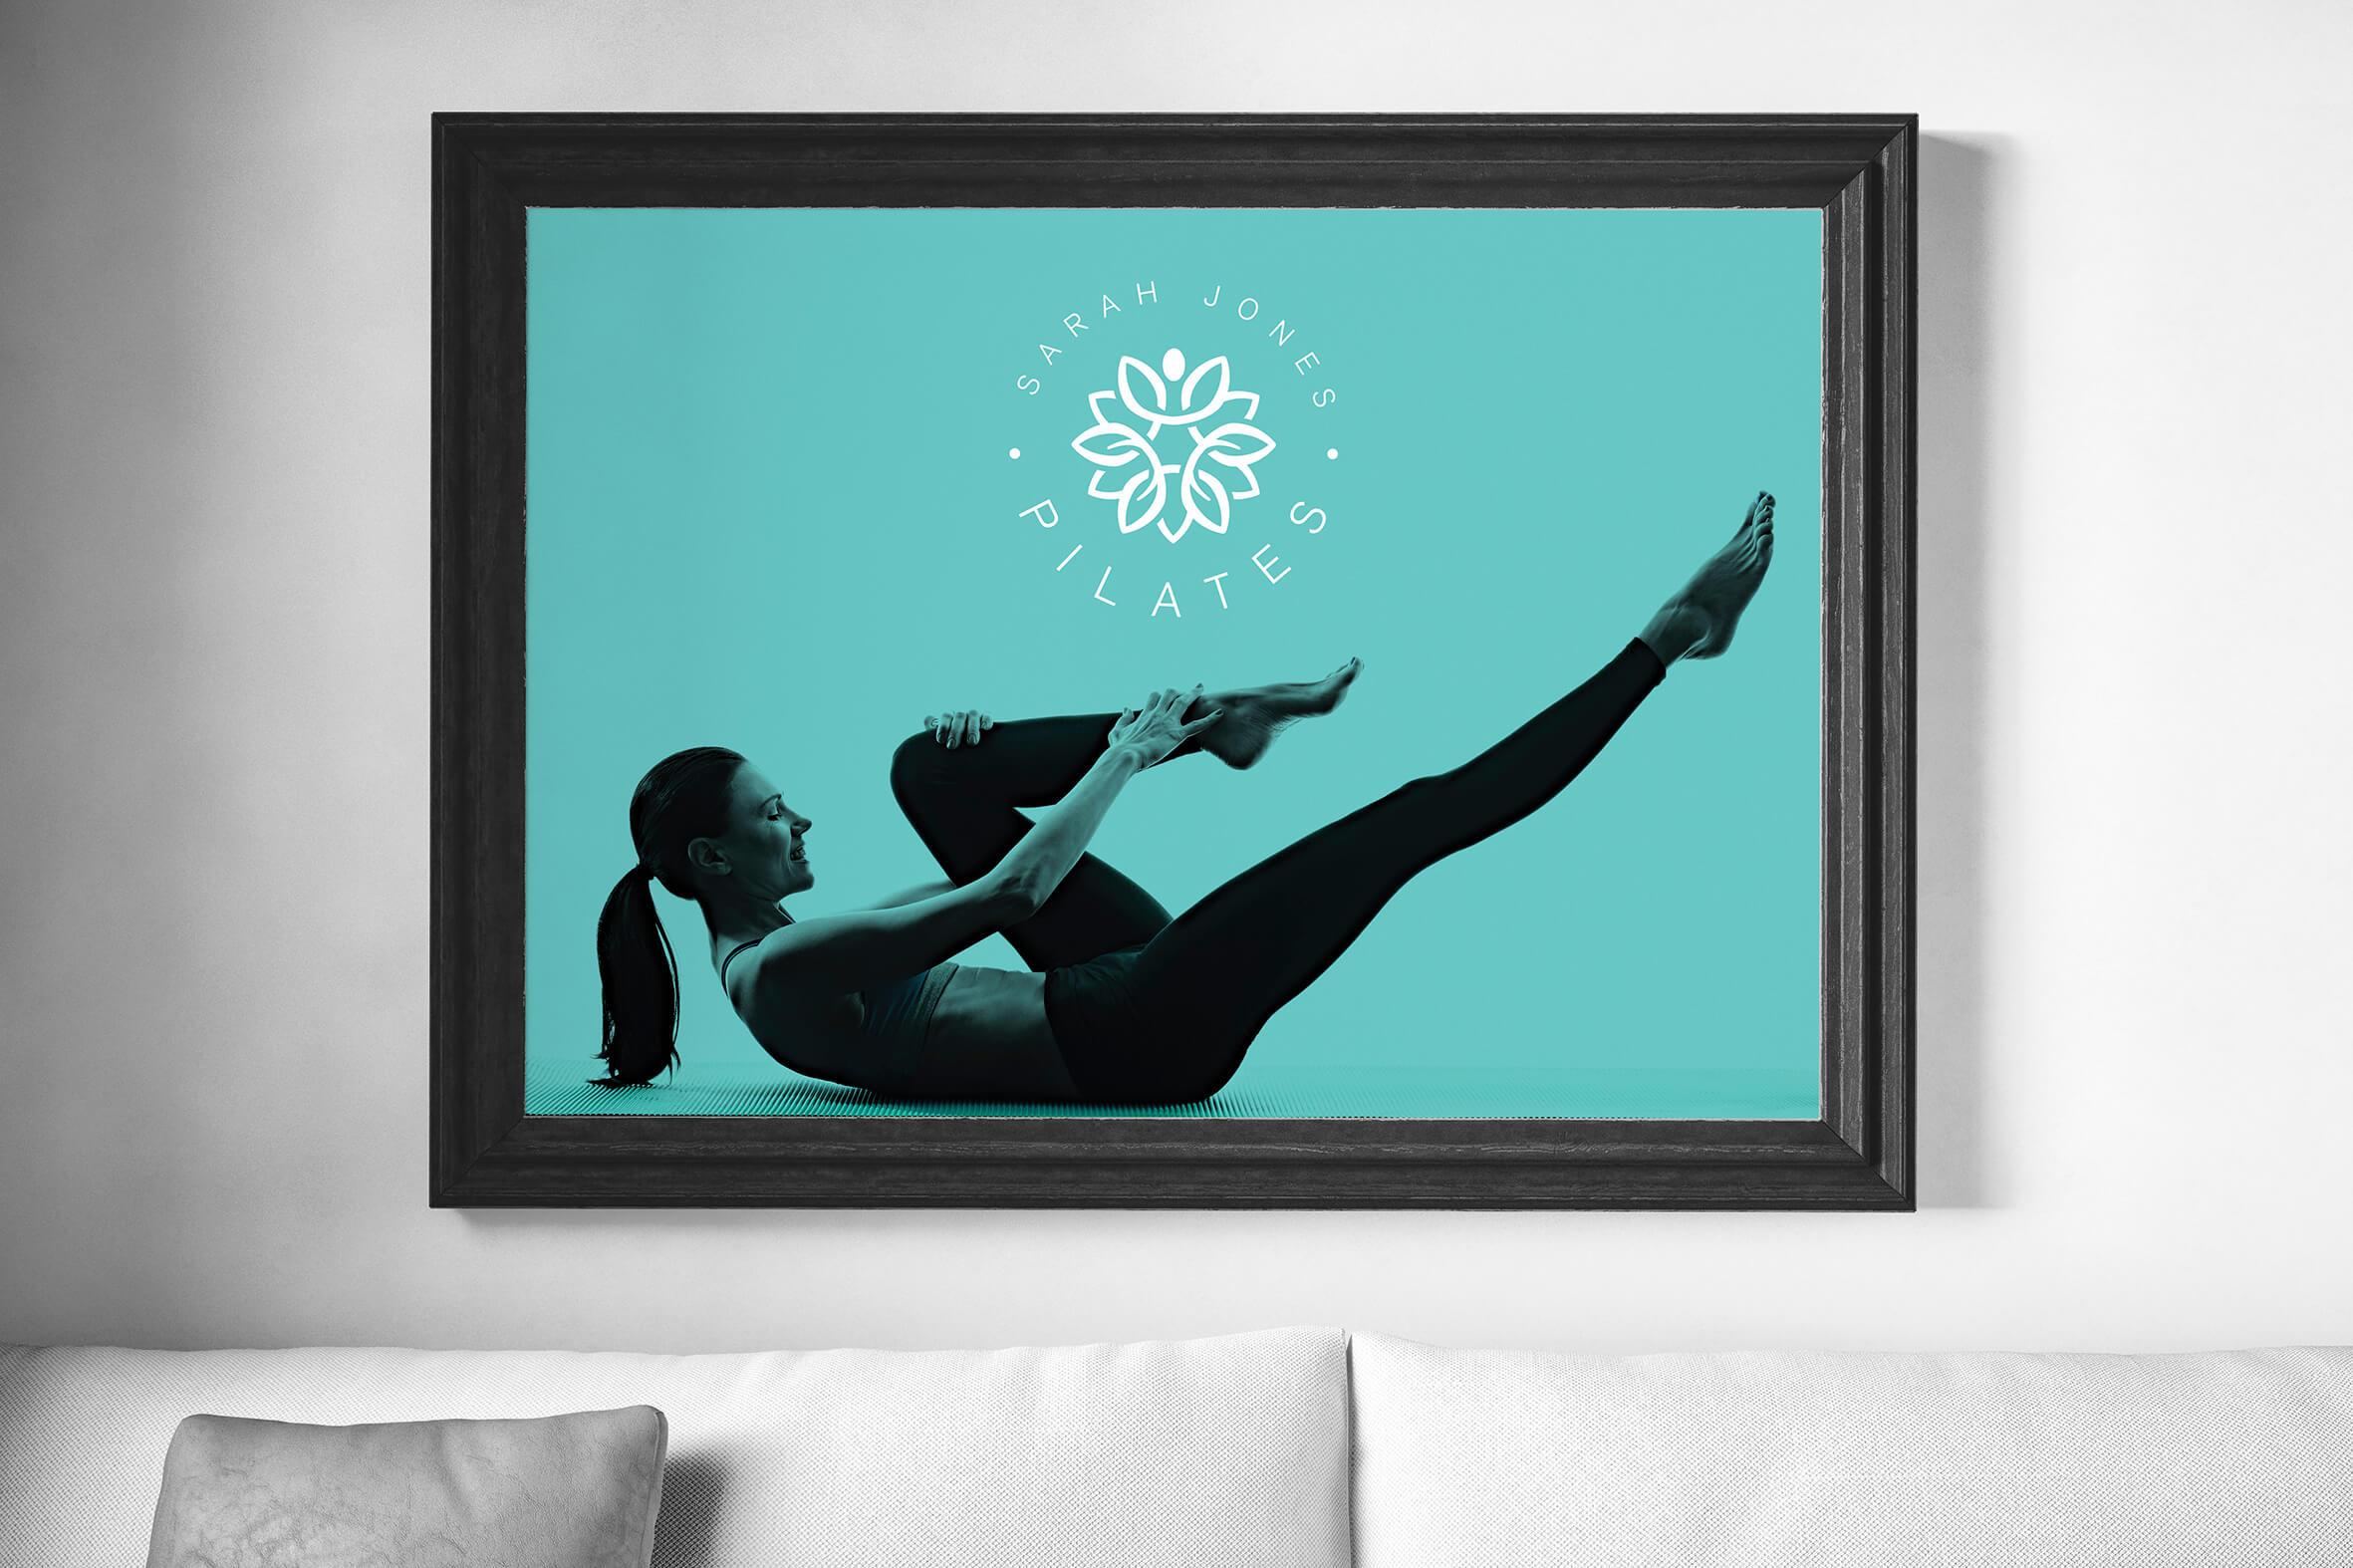 Sarah Jones Pilates branding.jpg